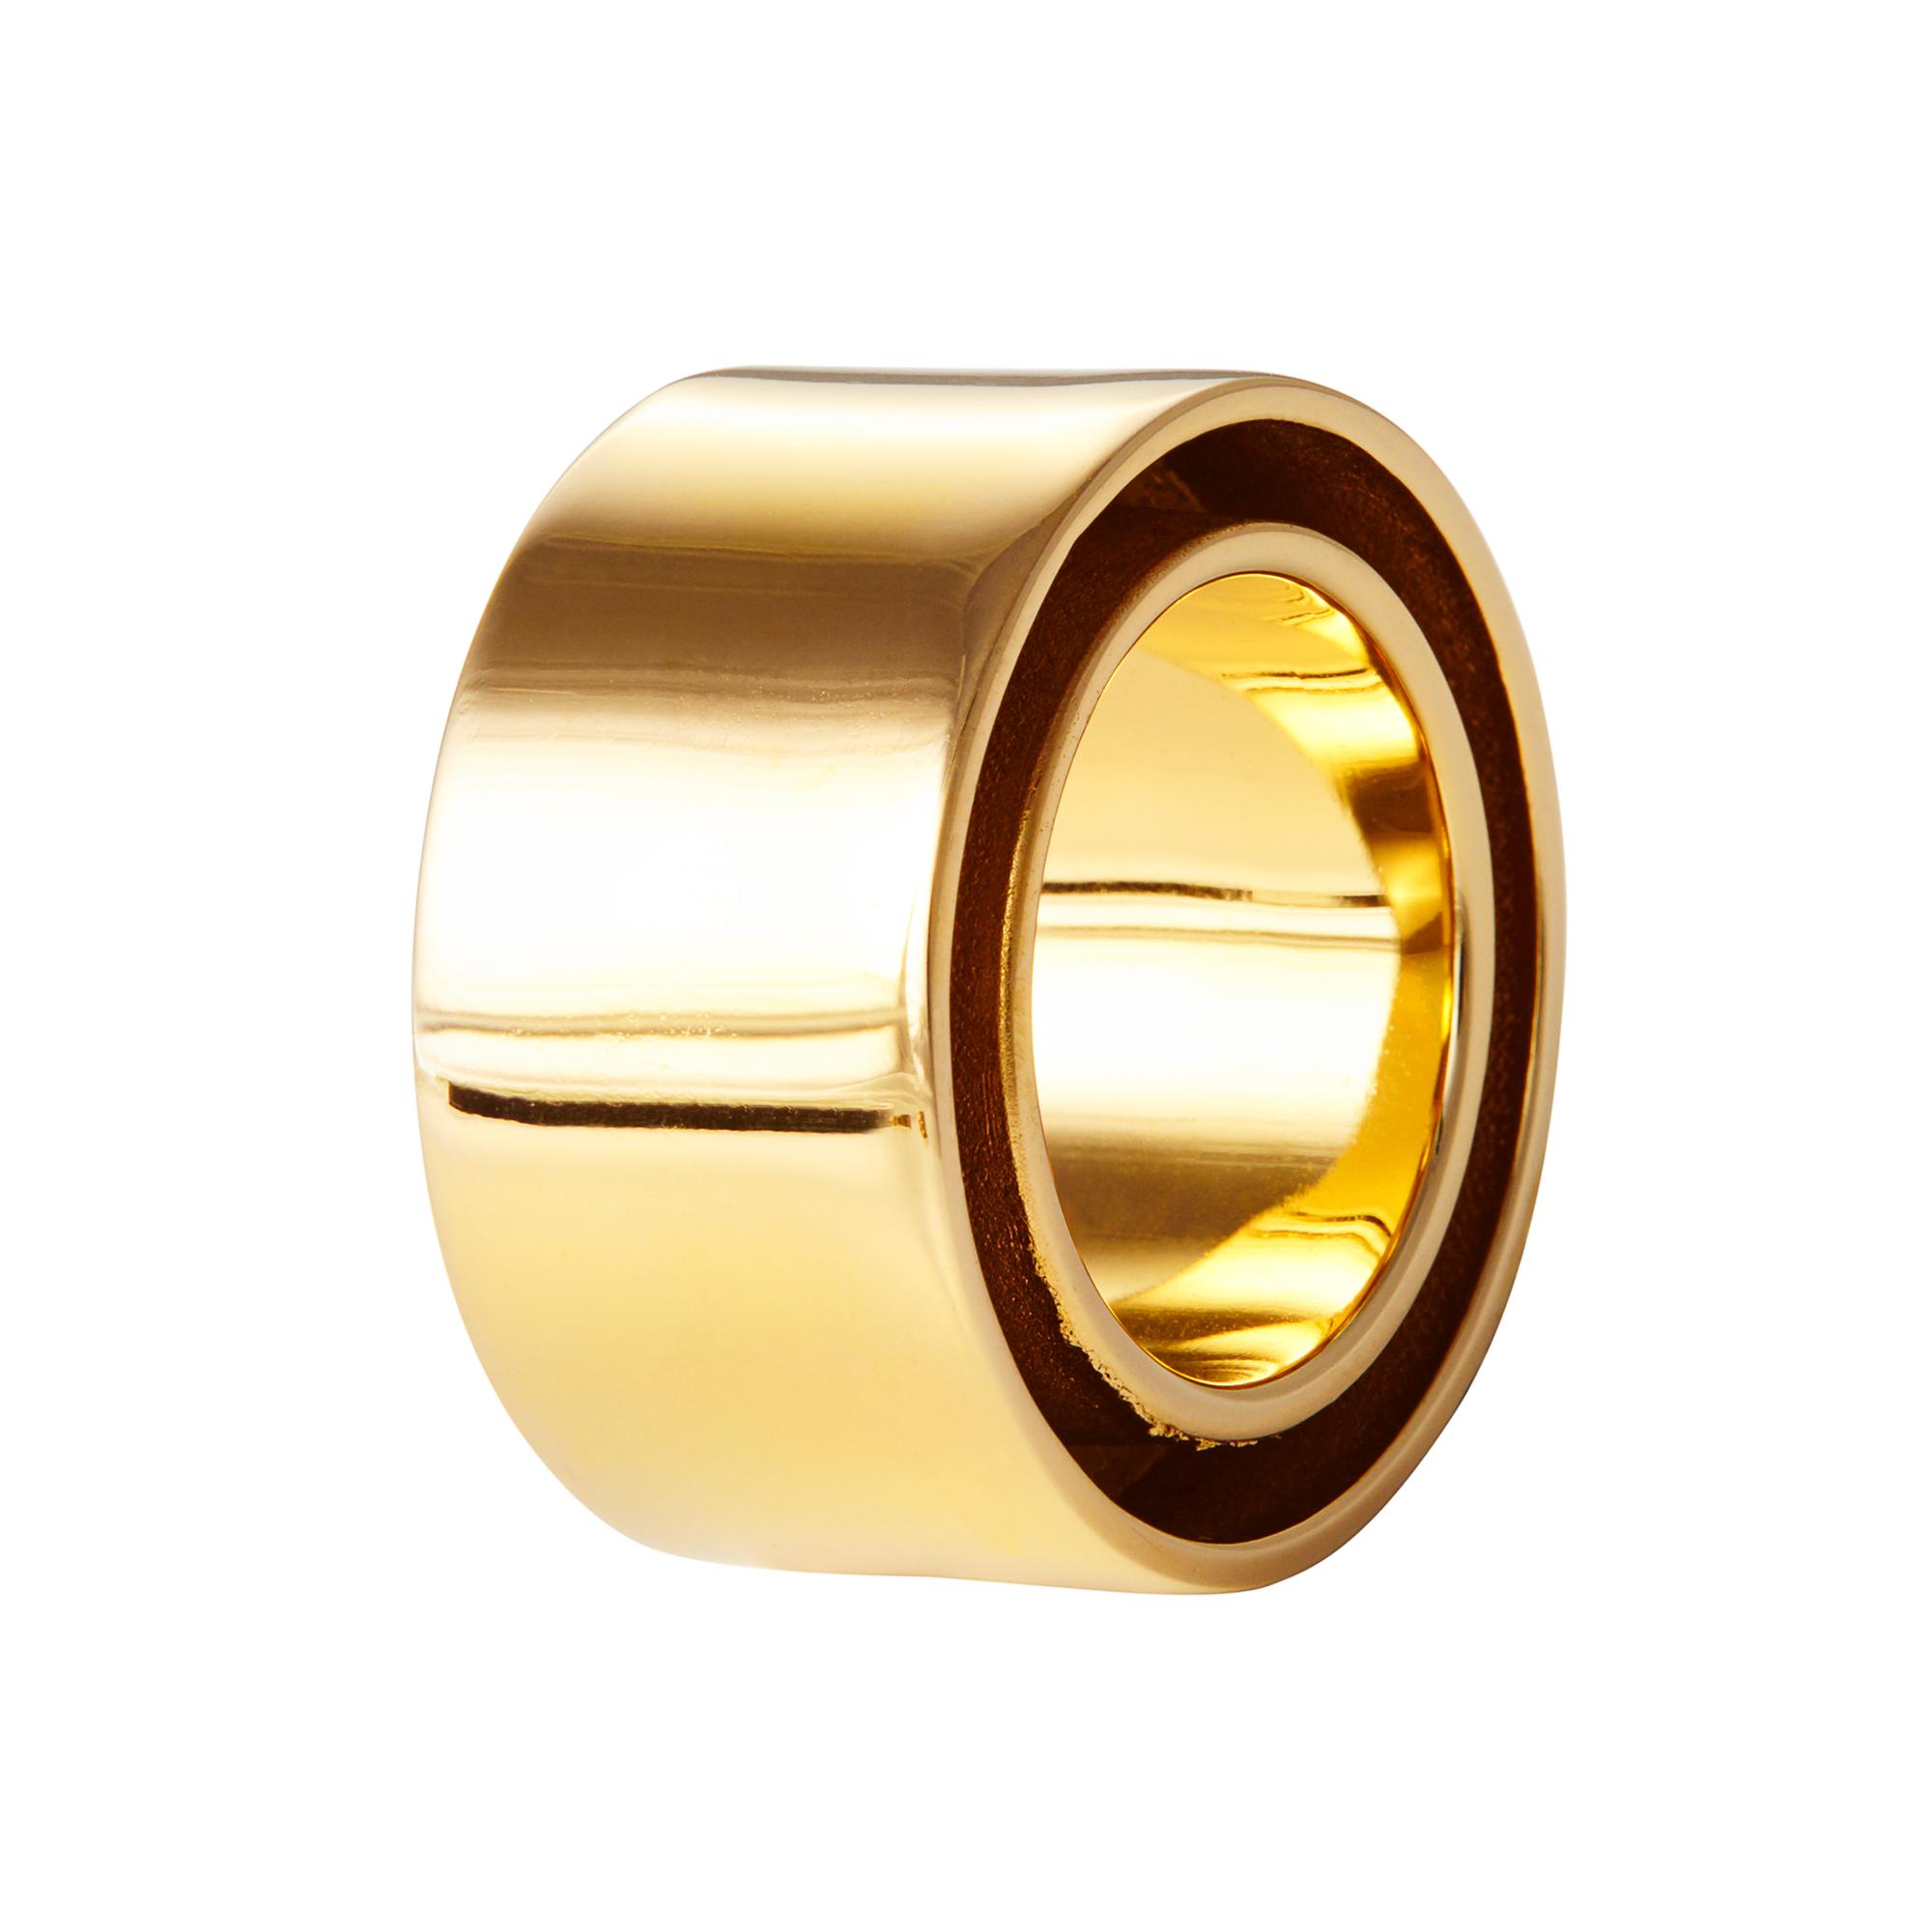 ipn_extra_wide_ring_gold_2.jpg